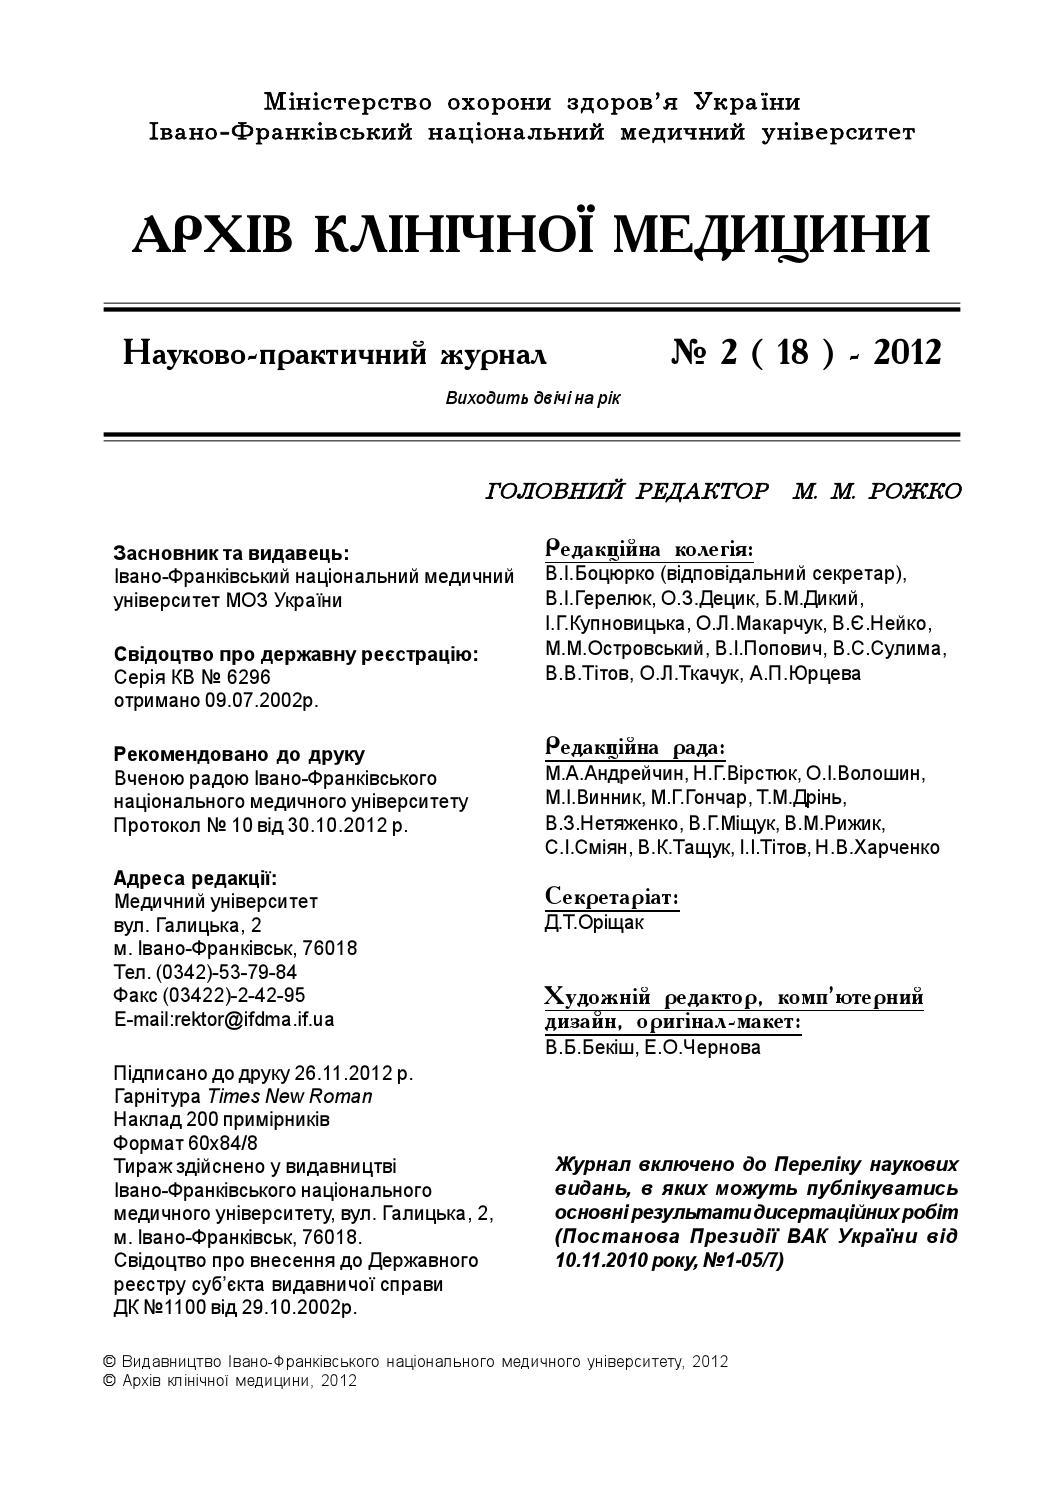 оксиферрискарбон натрия инструкция